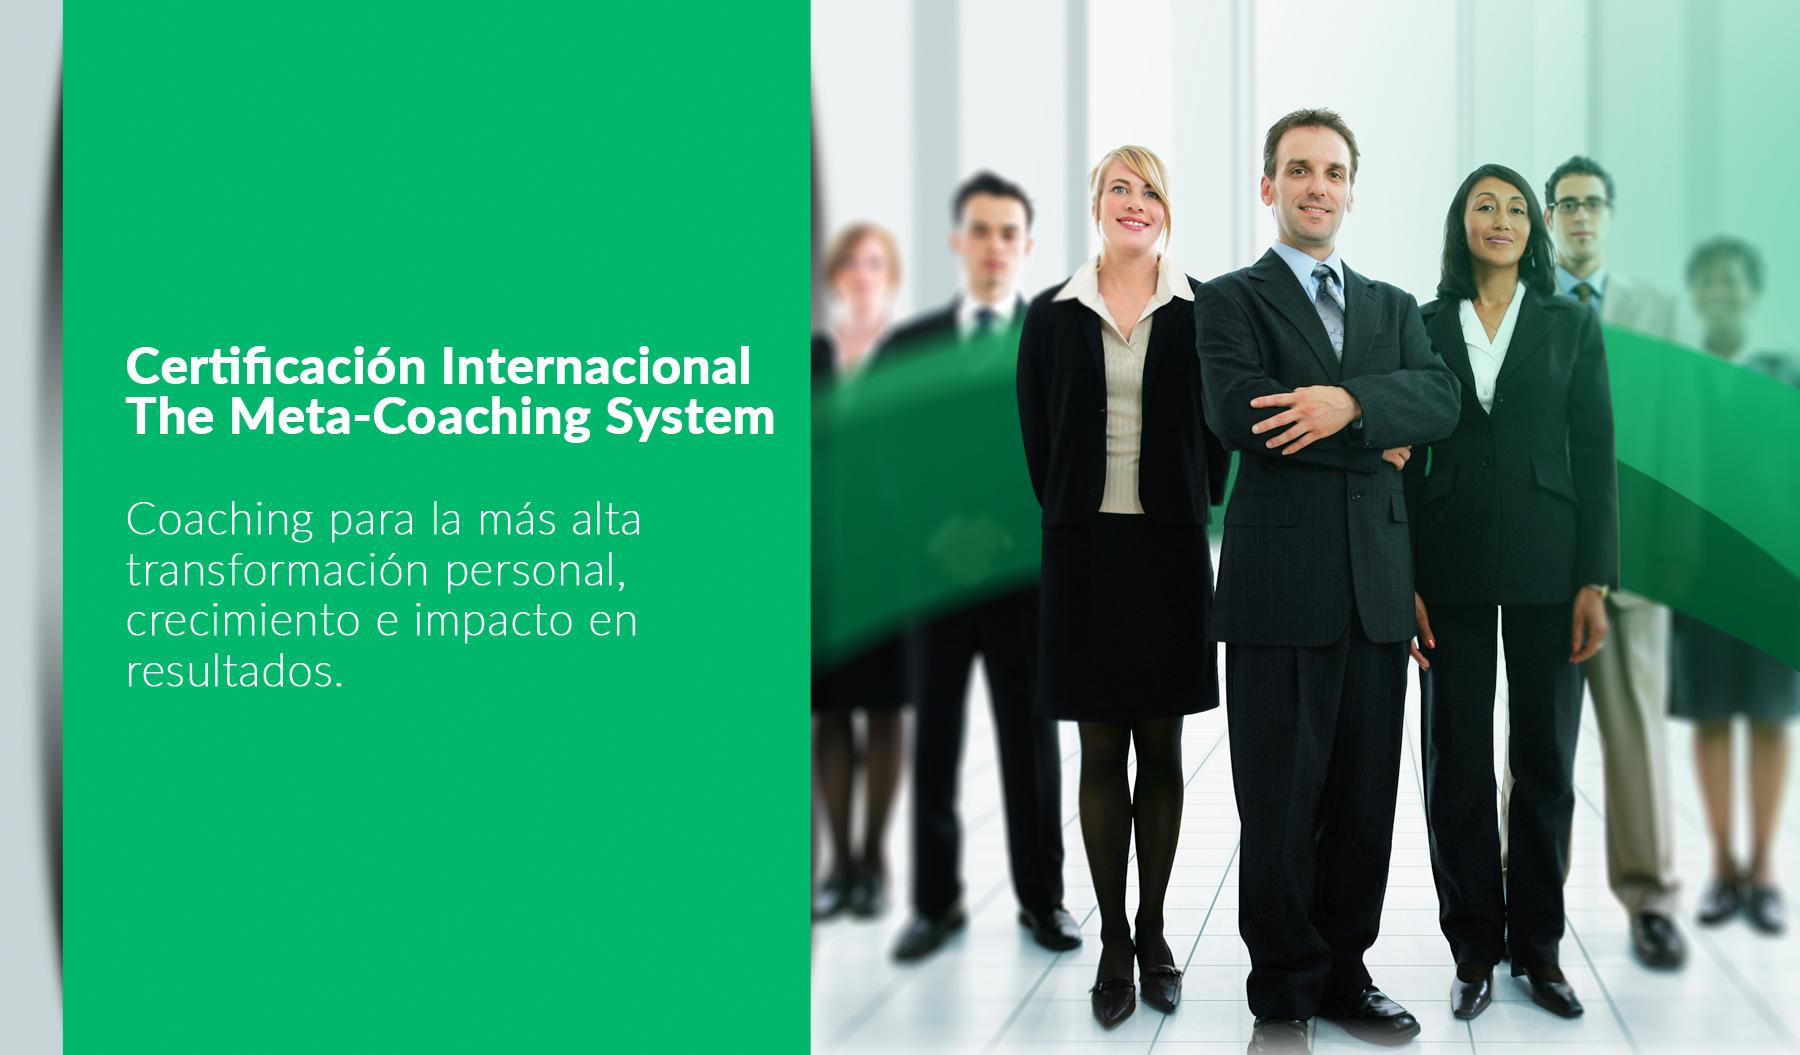 certificacion-internacional-the-meta-coaching-system-en-monterrey